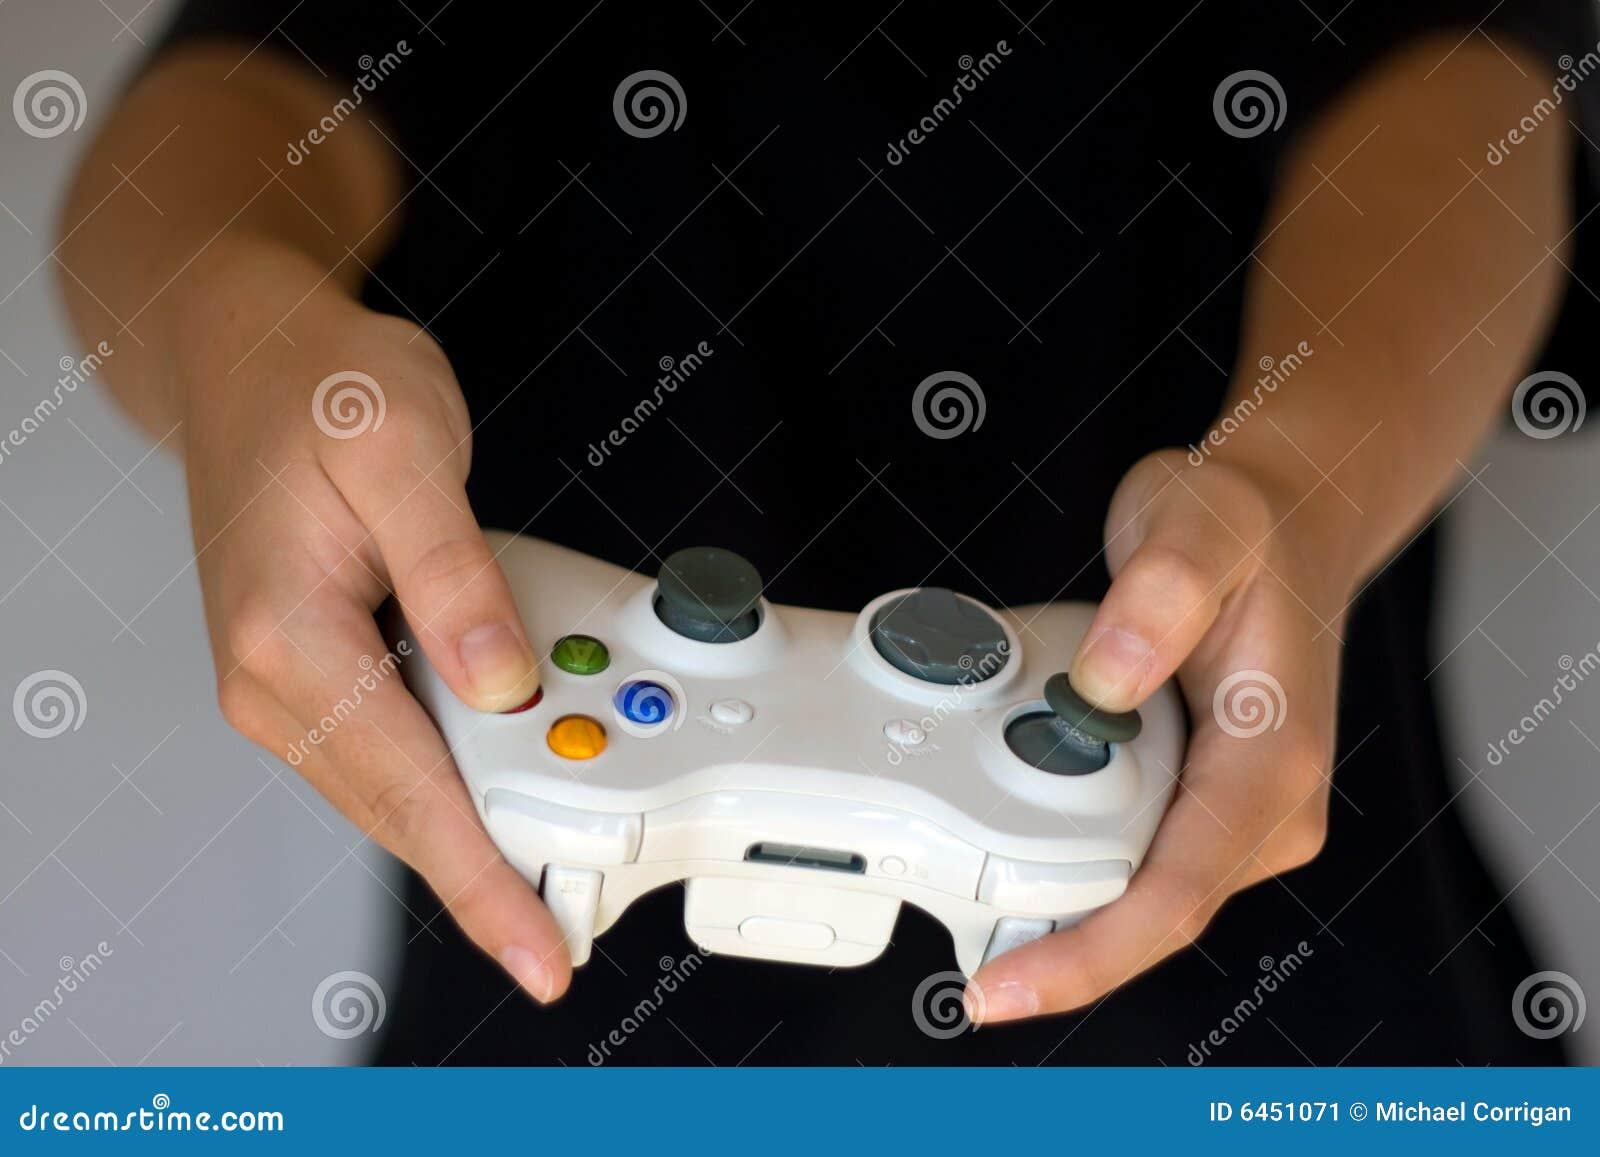 Manche de gamepad de console de jeu vidéo